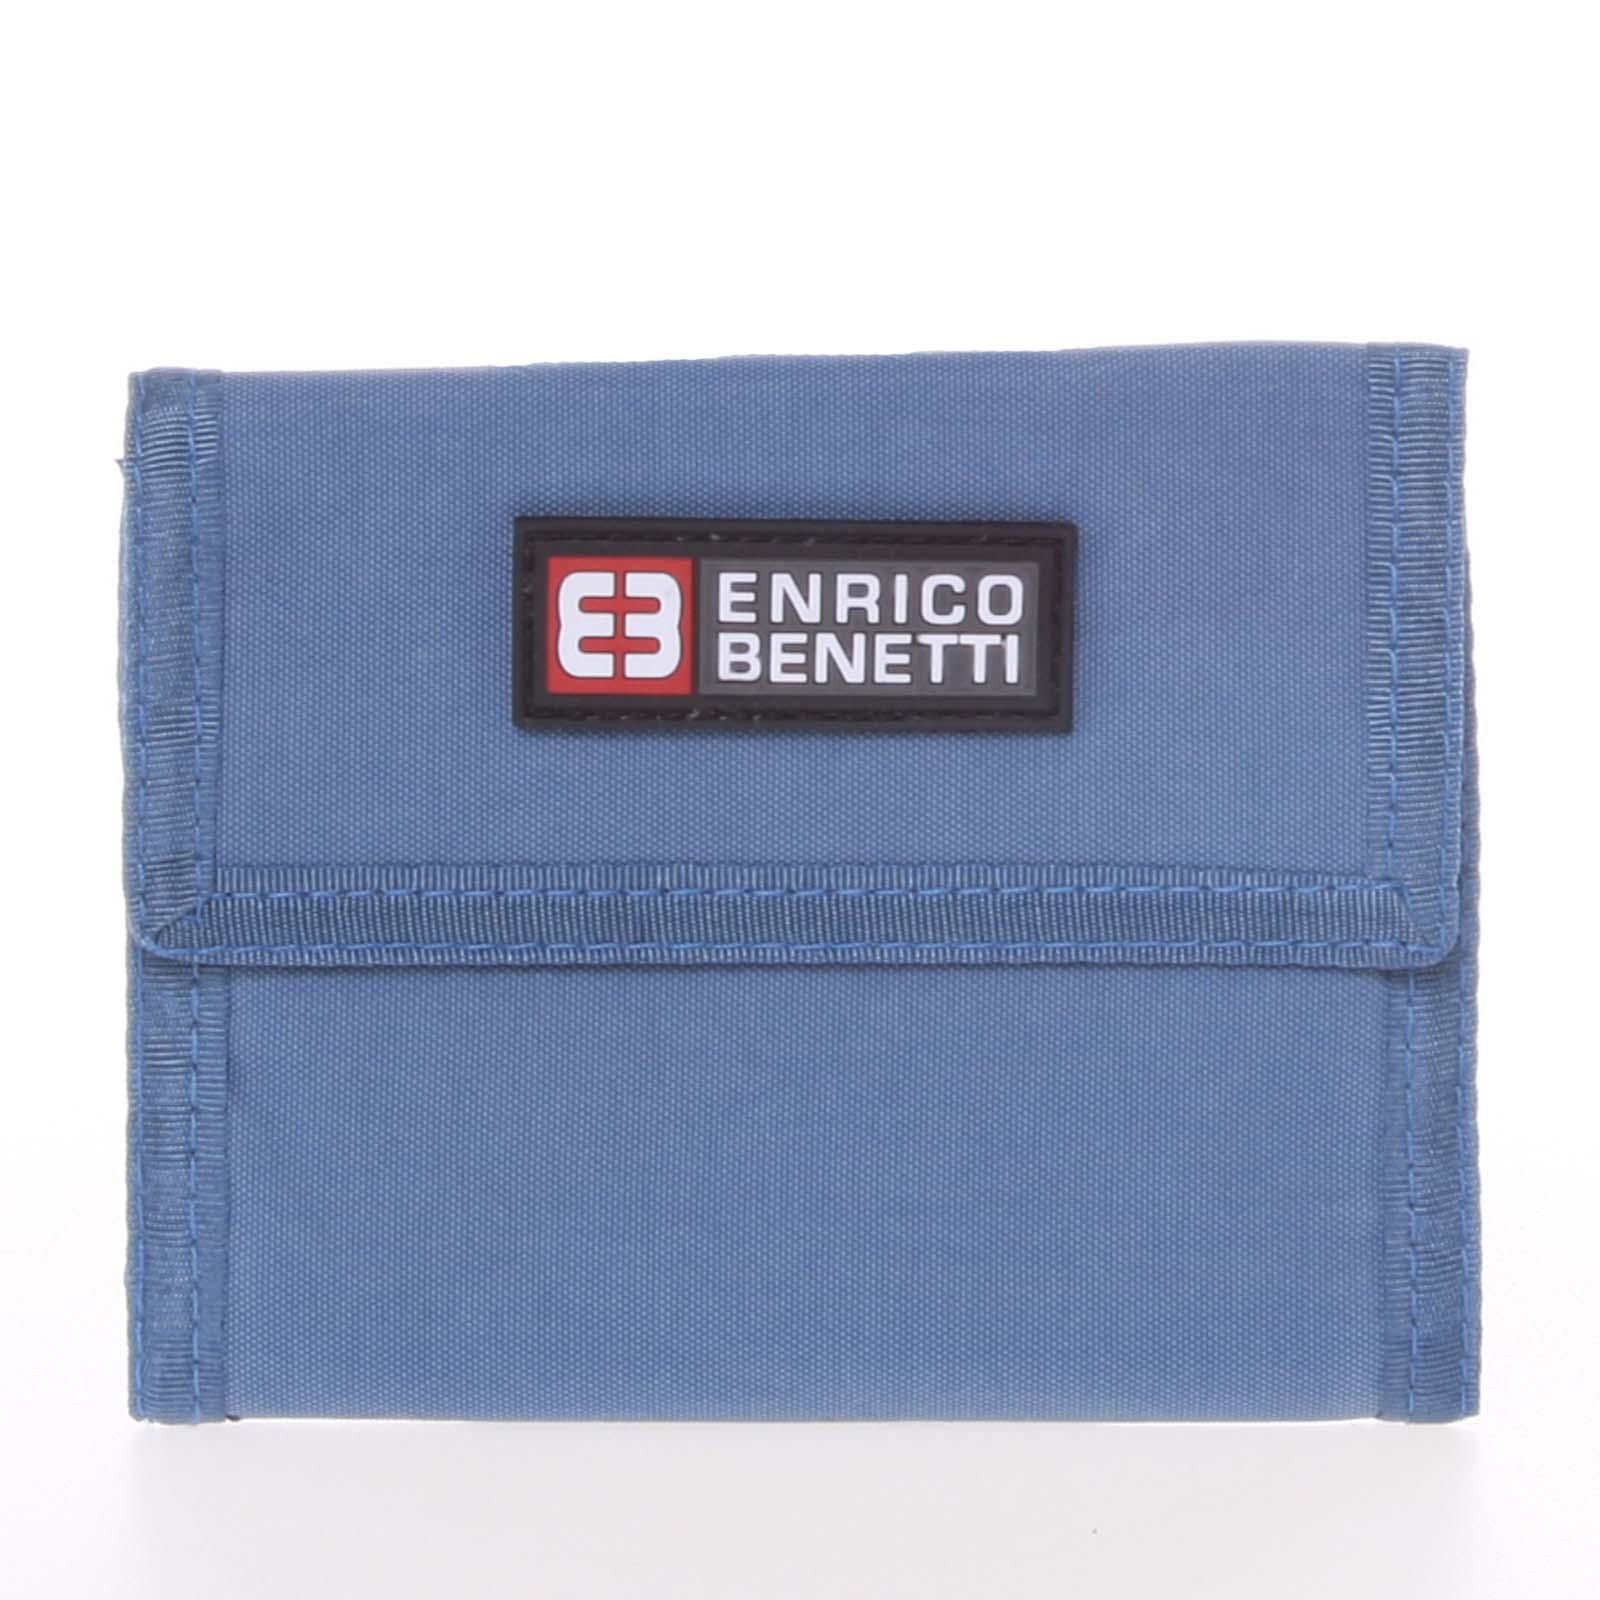 Rifľová látková peňaženka Enrico Benetti 14607